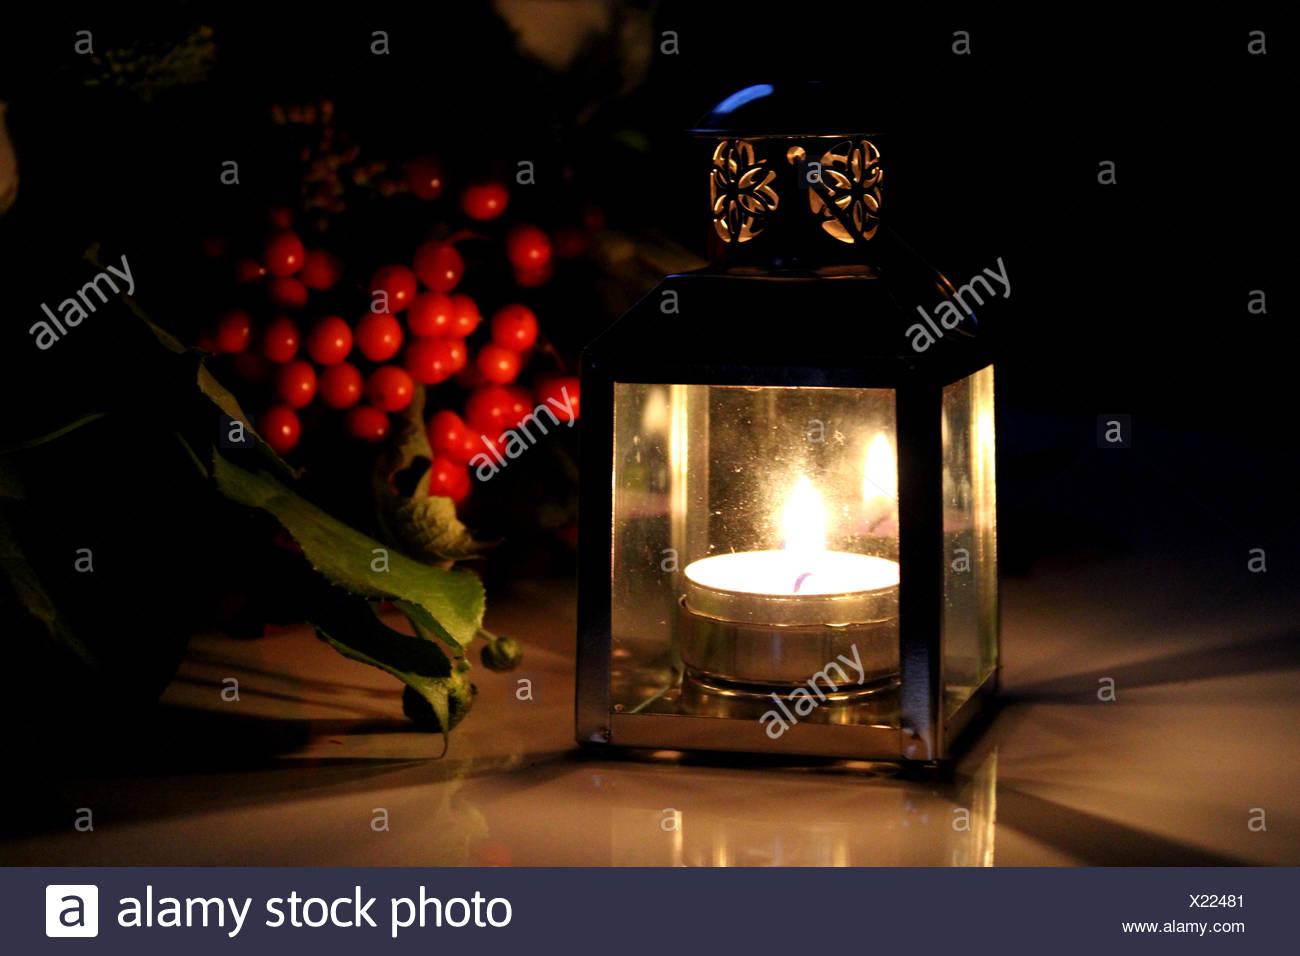 Tea Light Lantern Stock Photos & Tea Light Lantern Stock Images - Alamy